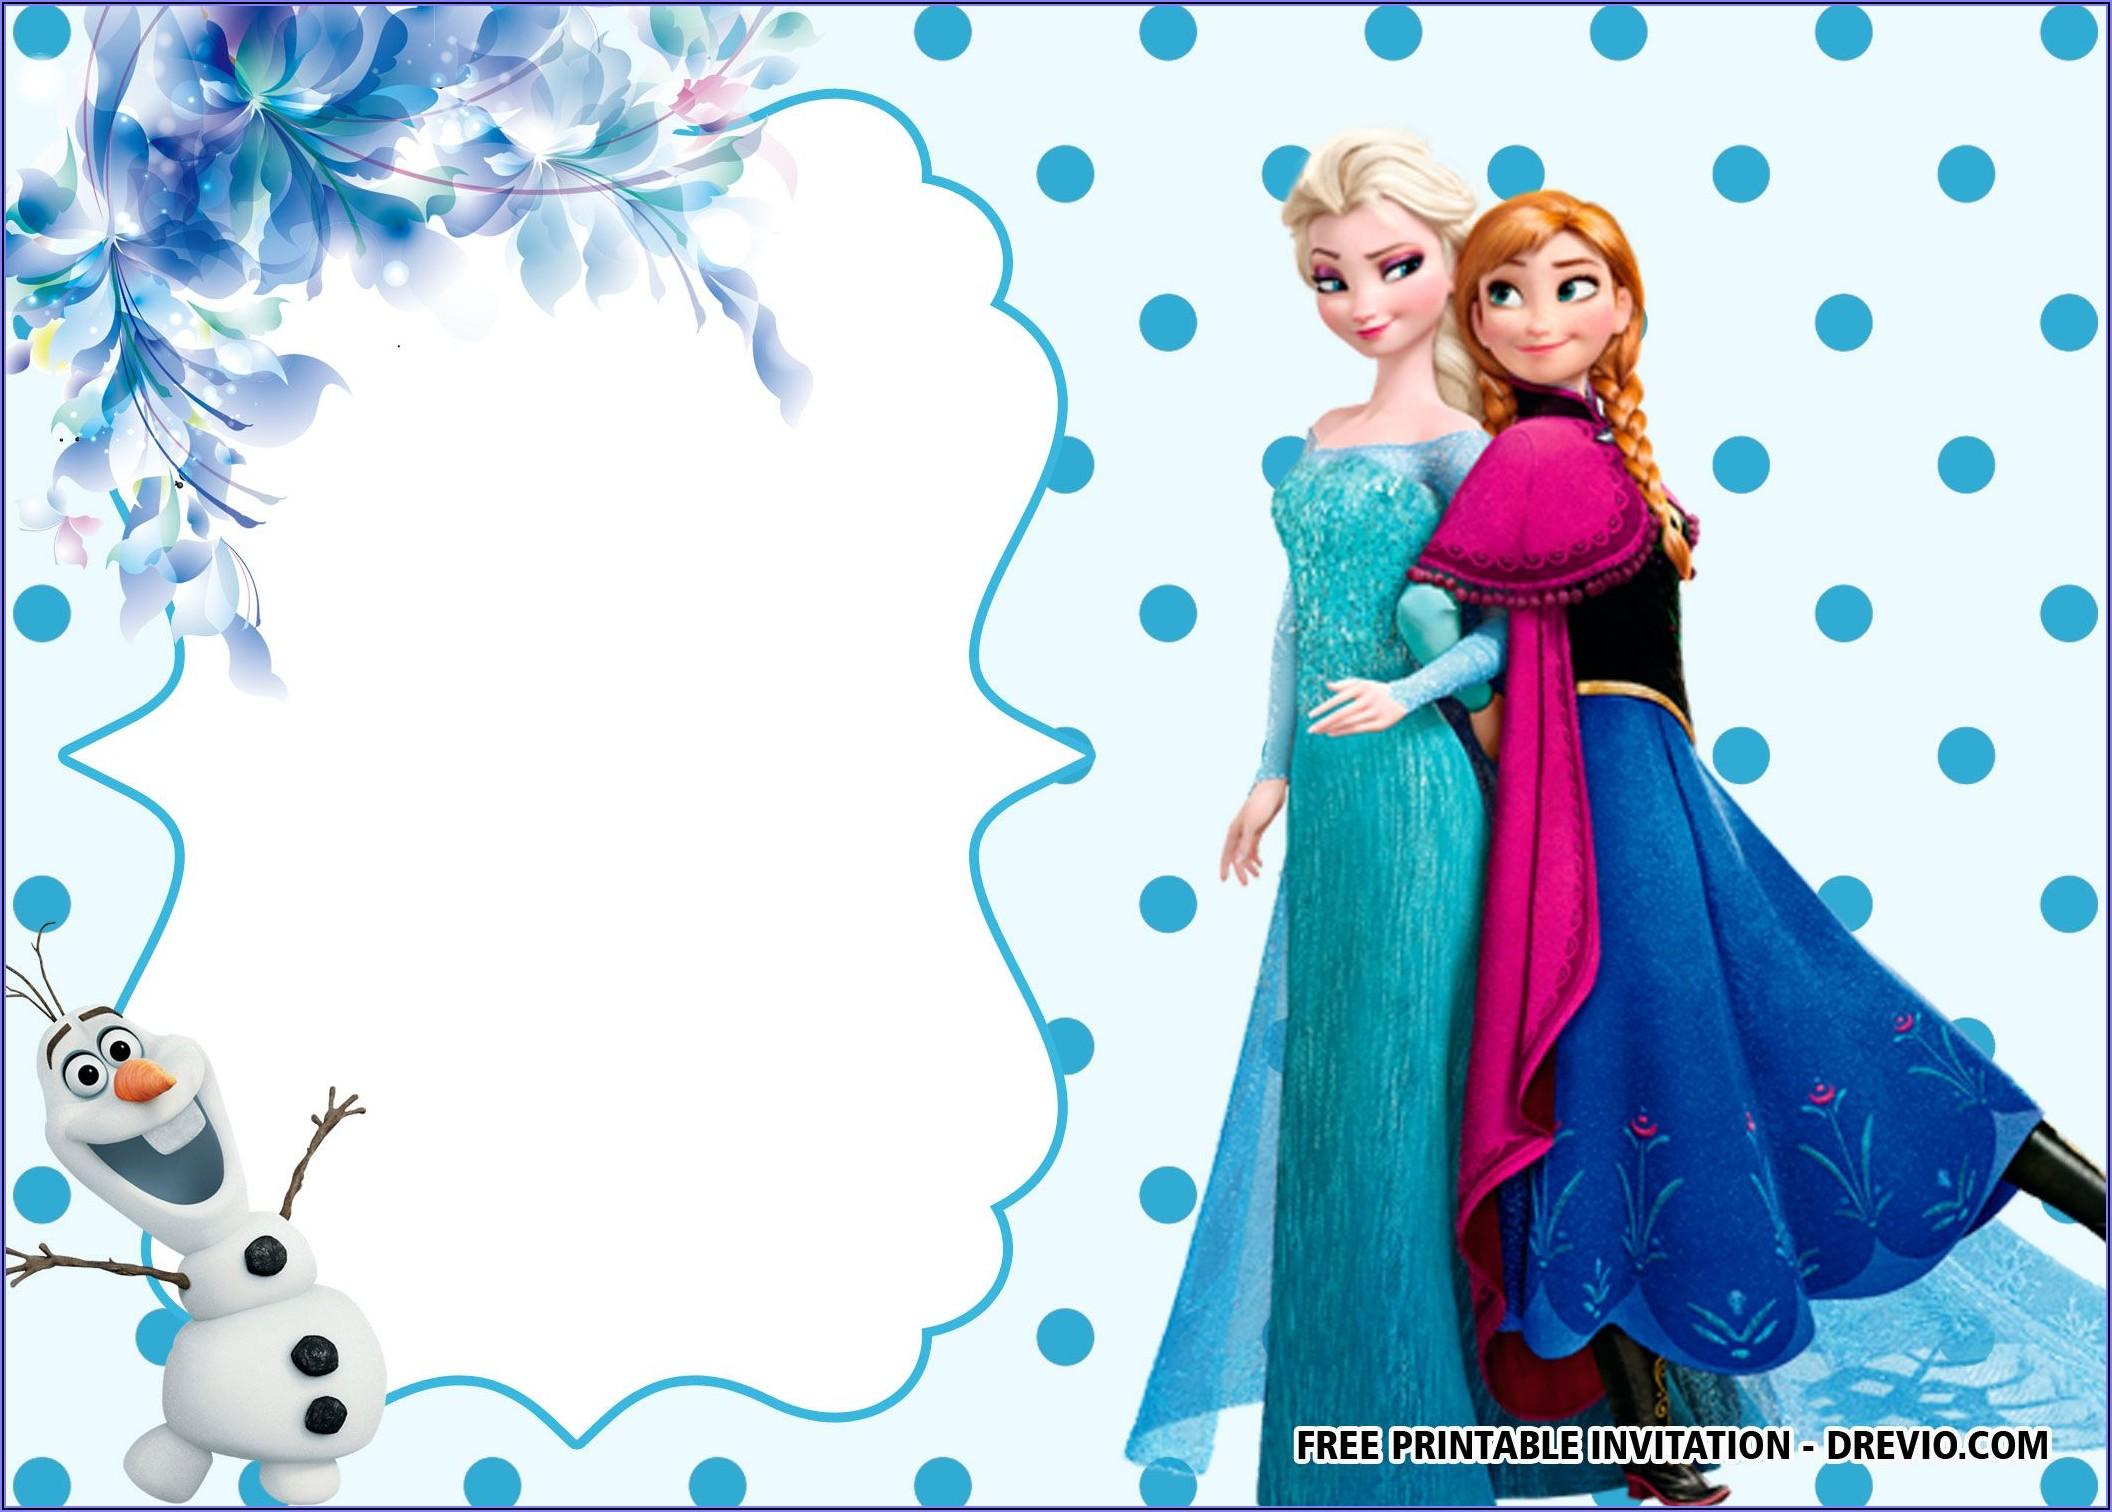 Frozen Invitation Card Template Free Download